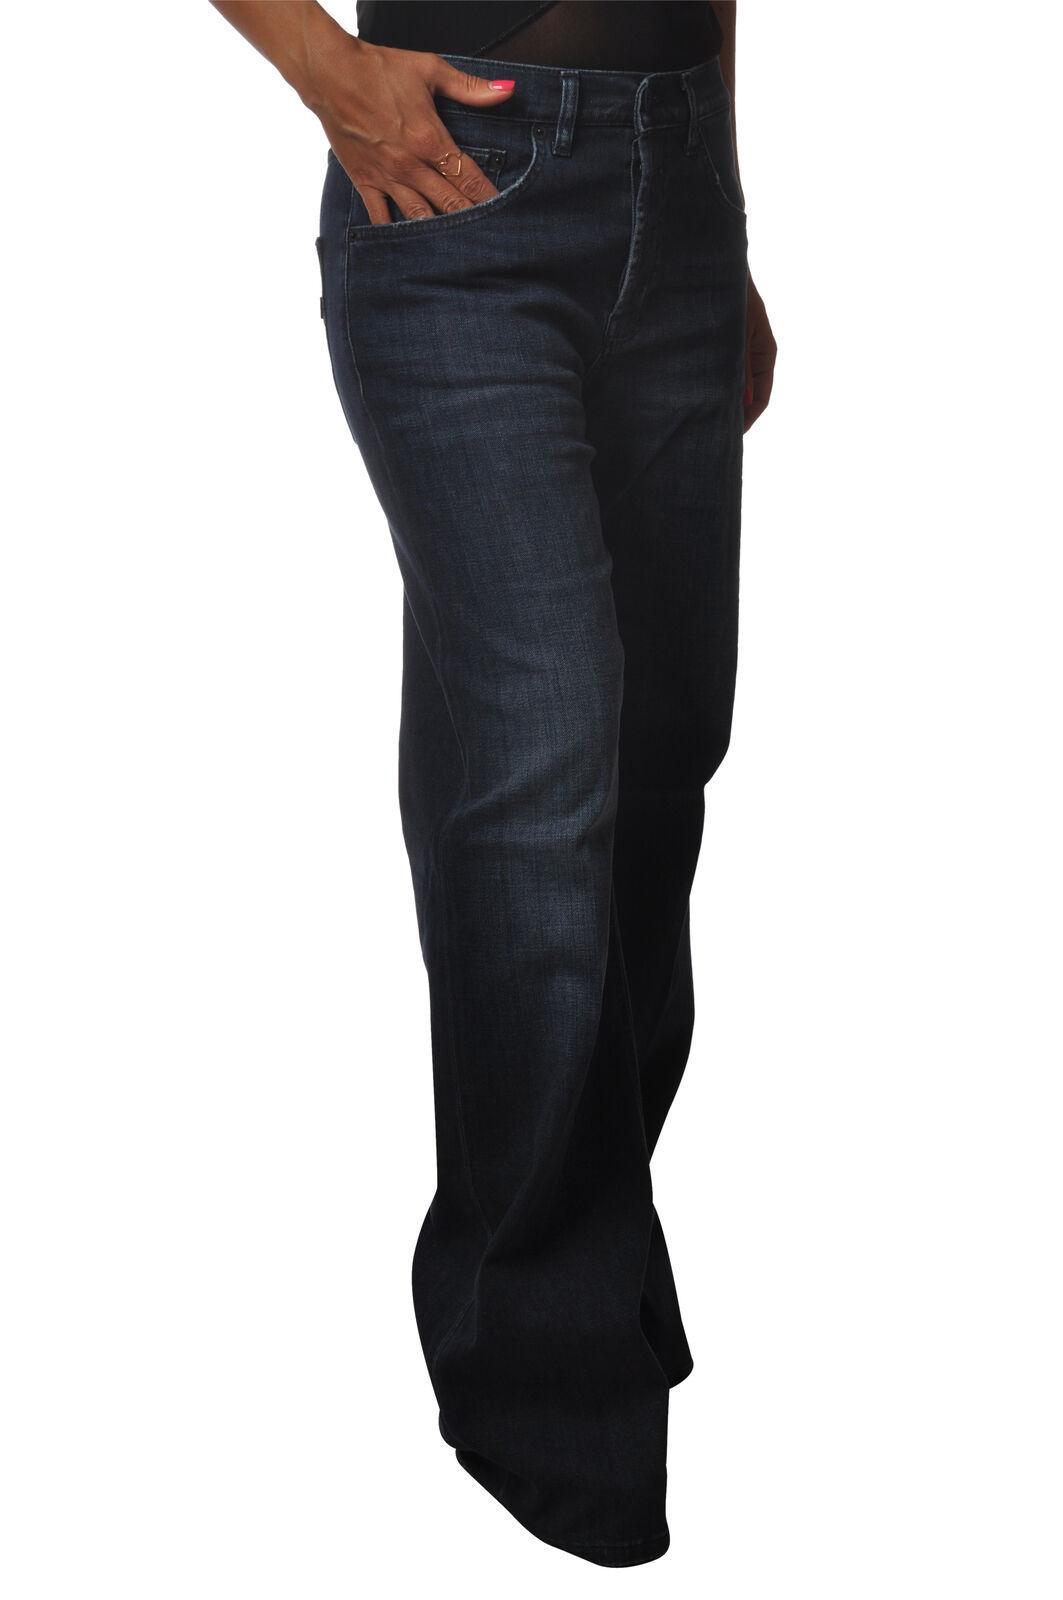 Dondup - Jeans-straight leg  Pants - Woman - Denim - 6435225G191343  nuevo listado